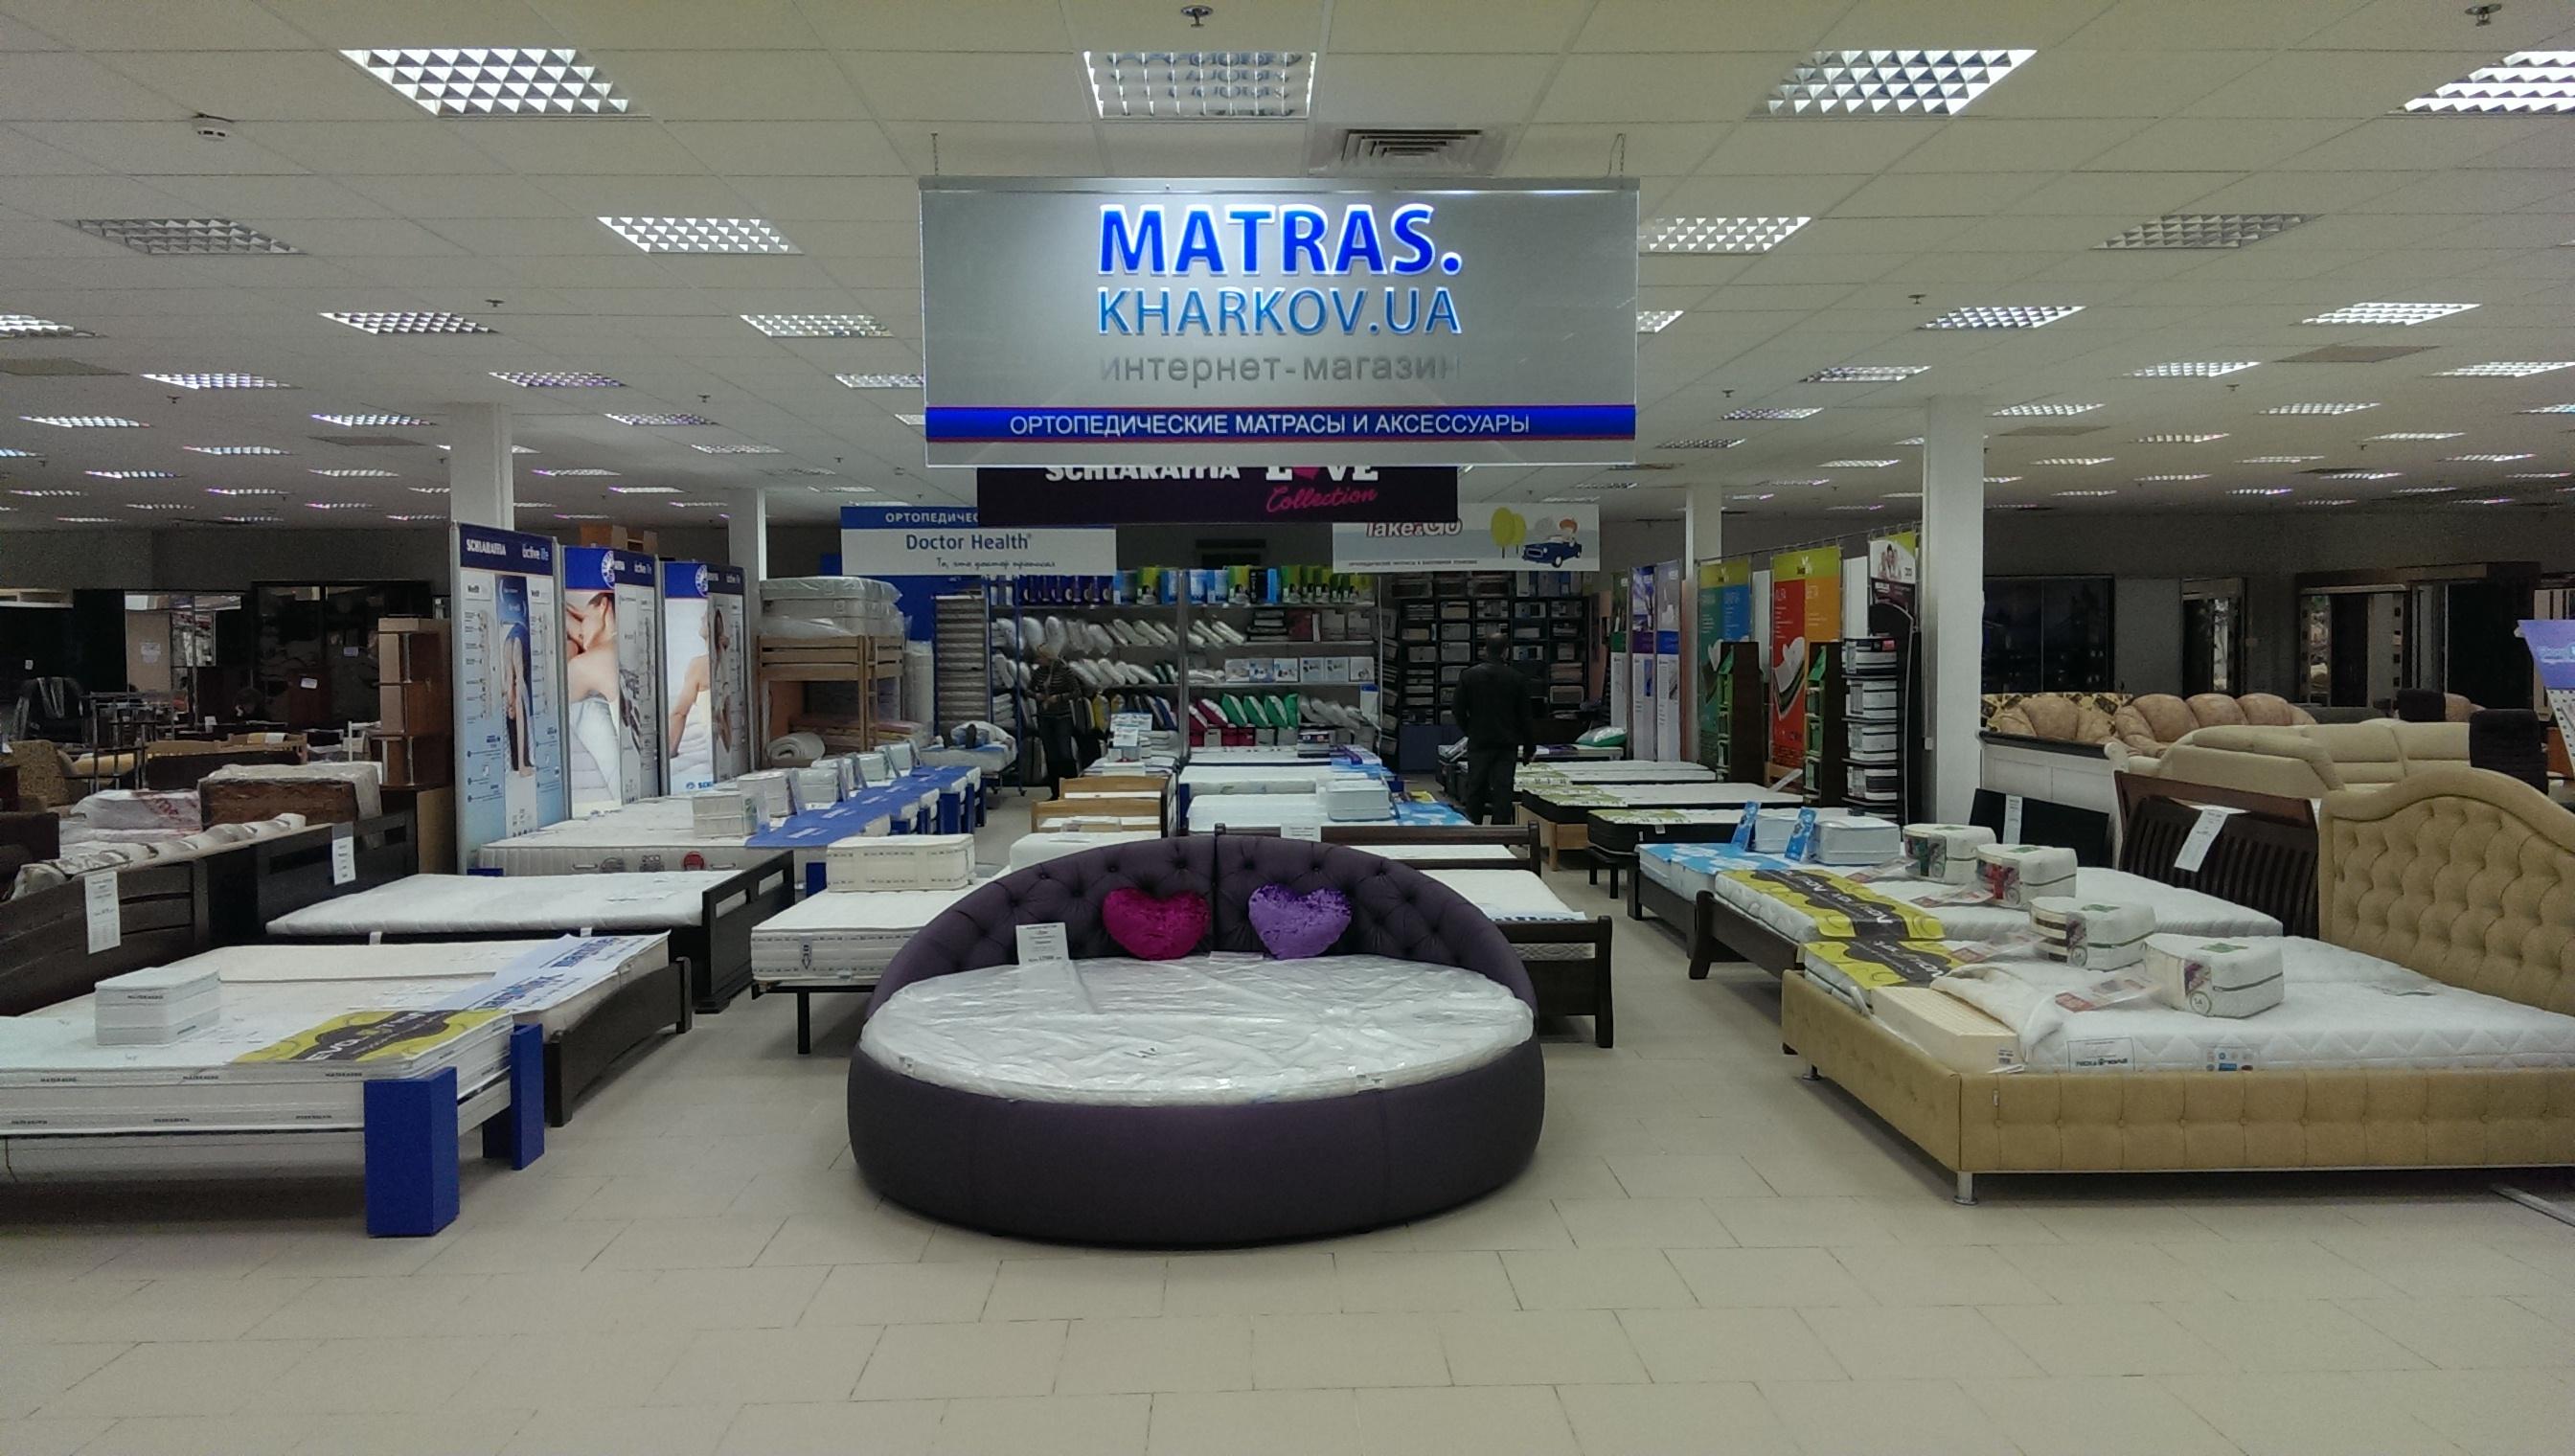 matras.kharkov.ua.jpg